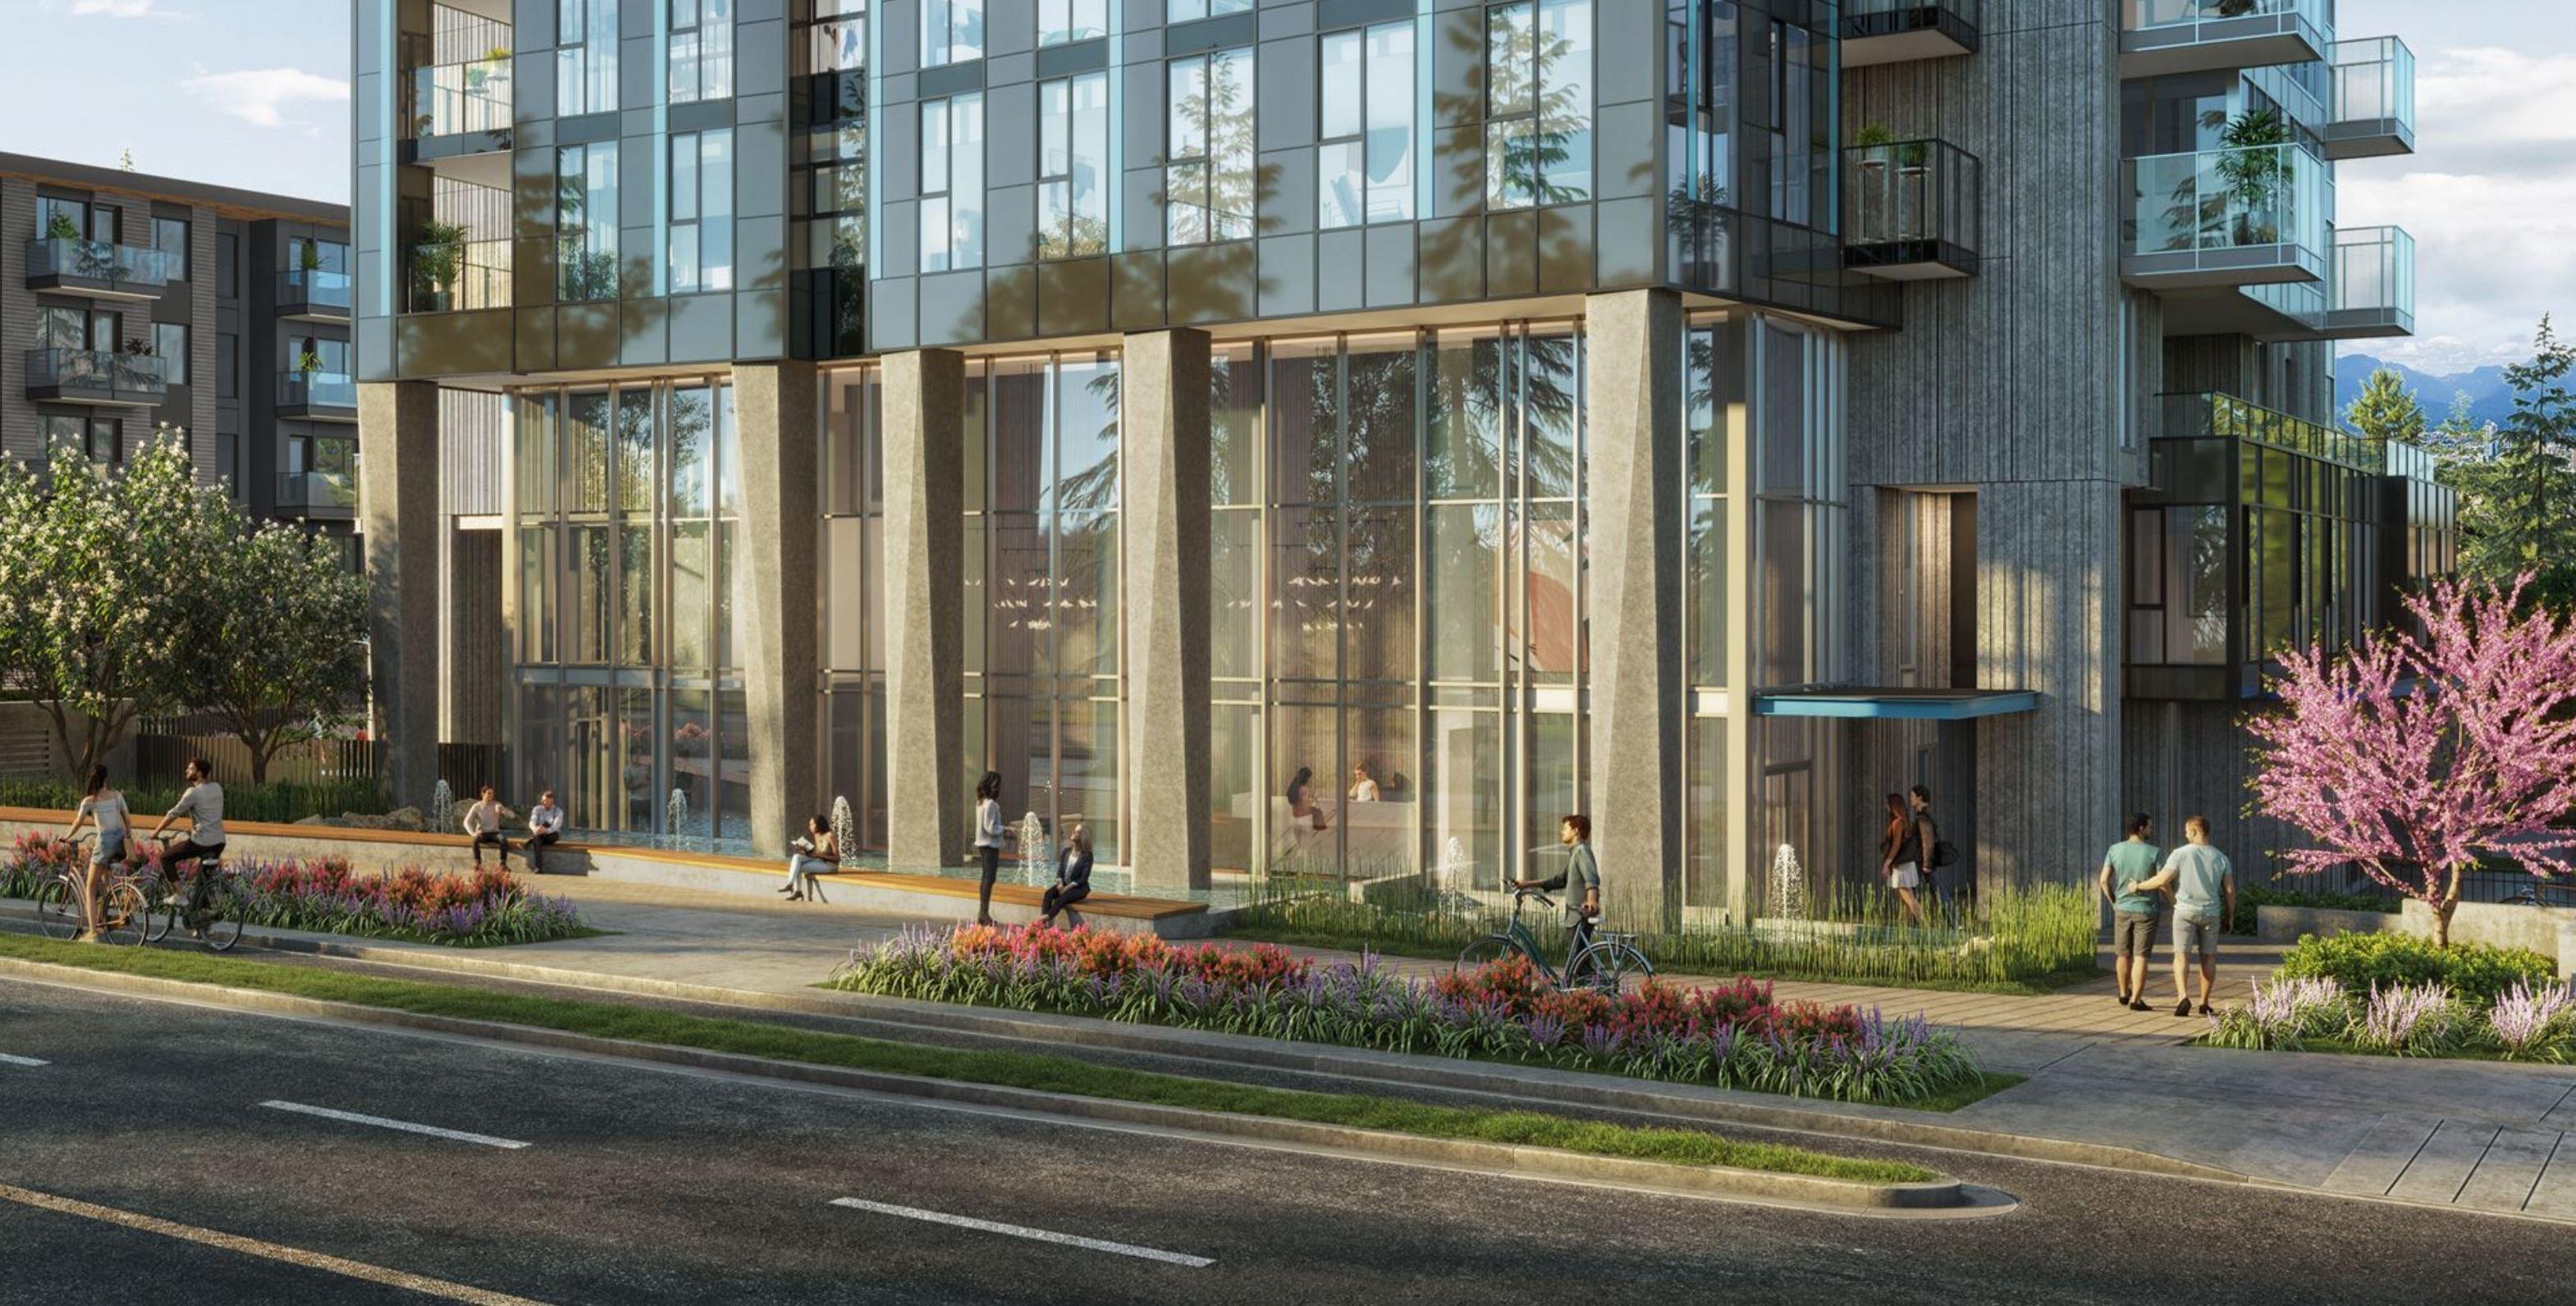 Artesia Metrotown - 4275 Grange St - Development by Qualex-Landmark!